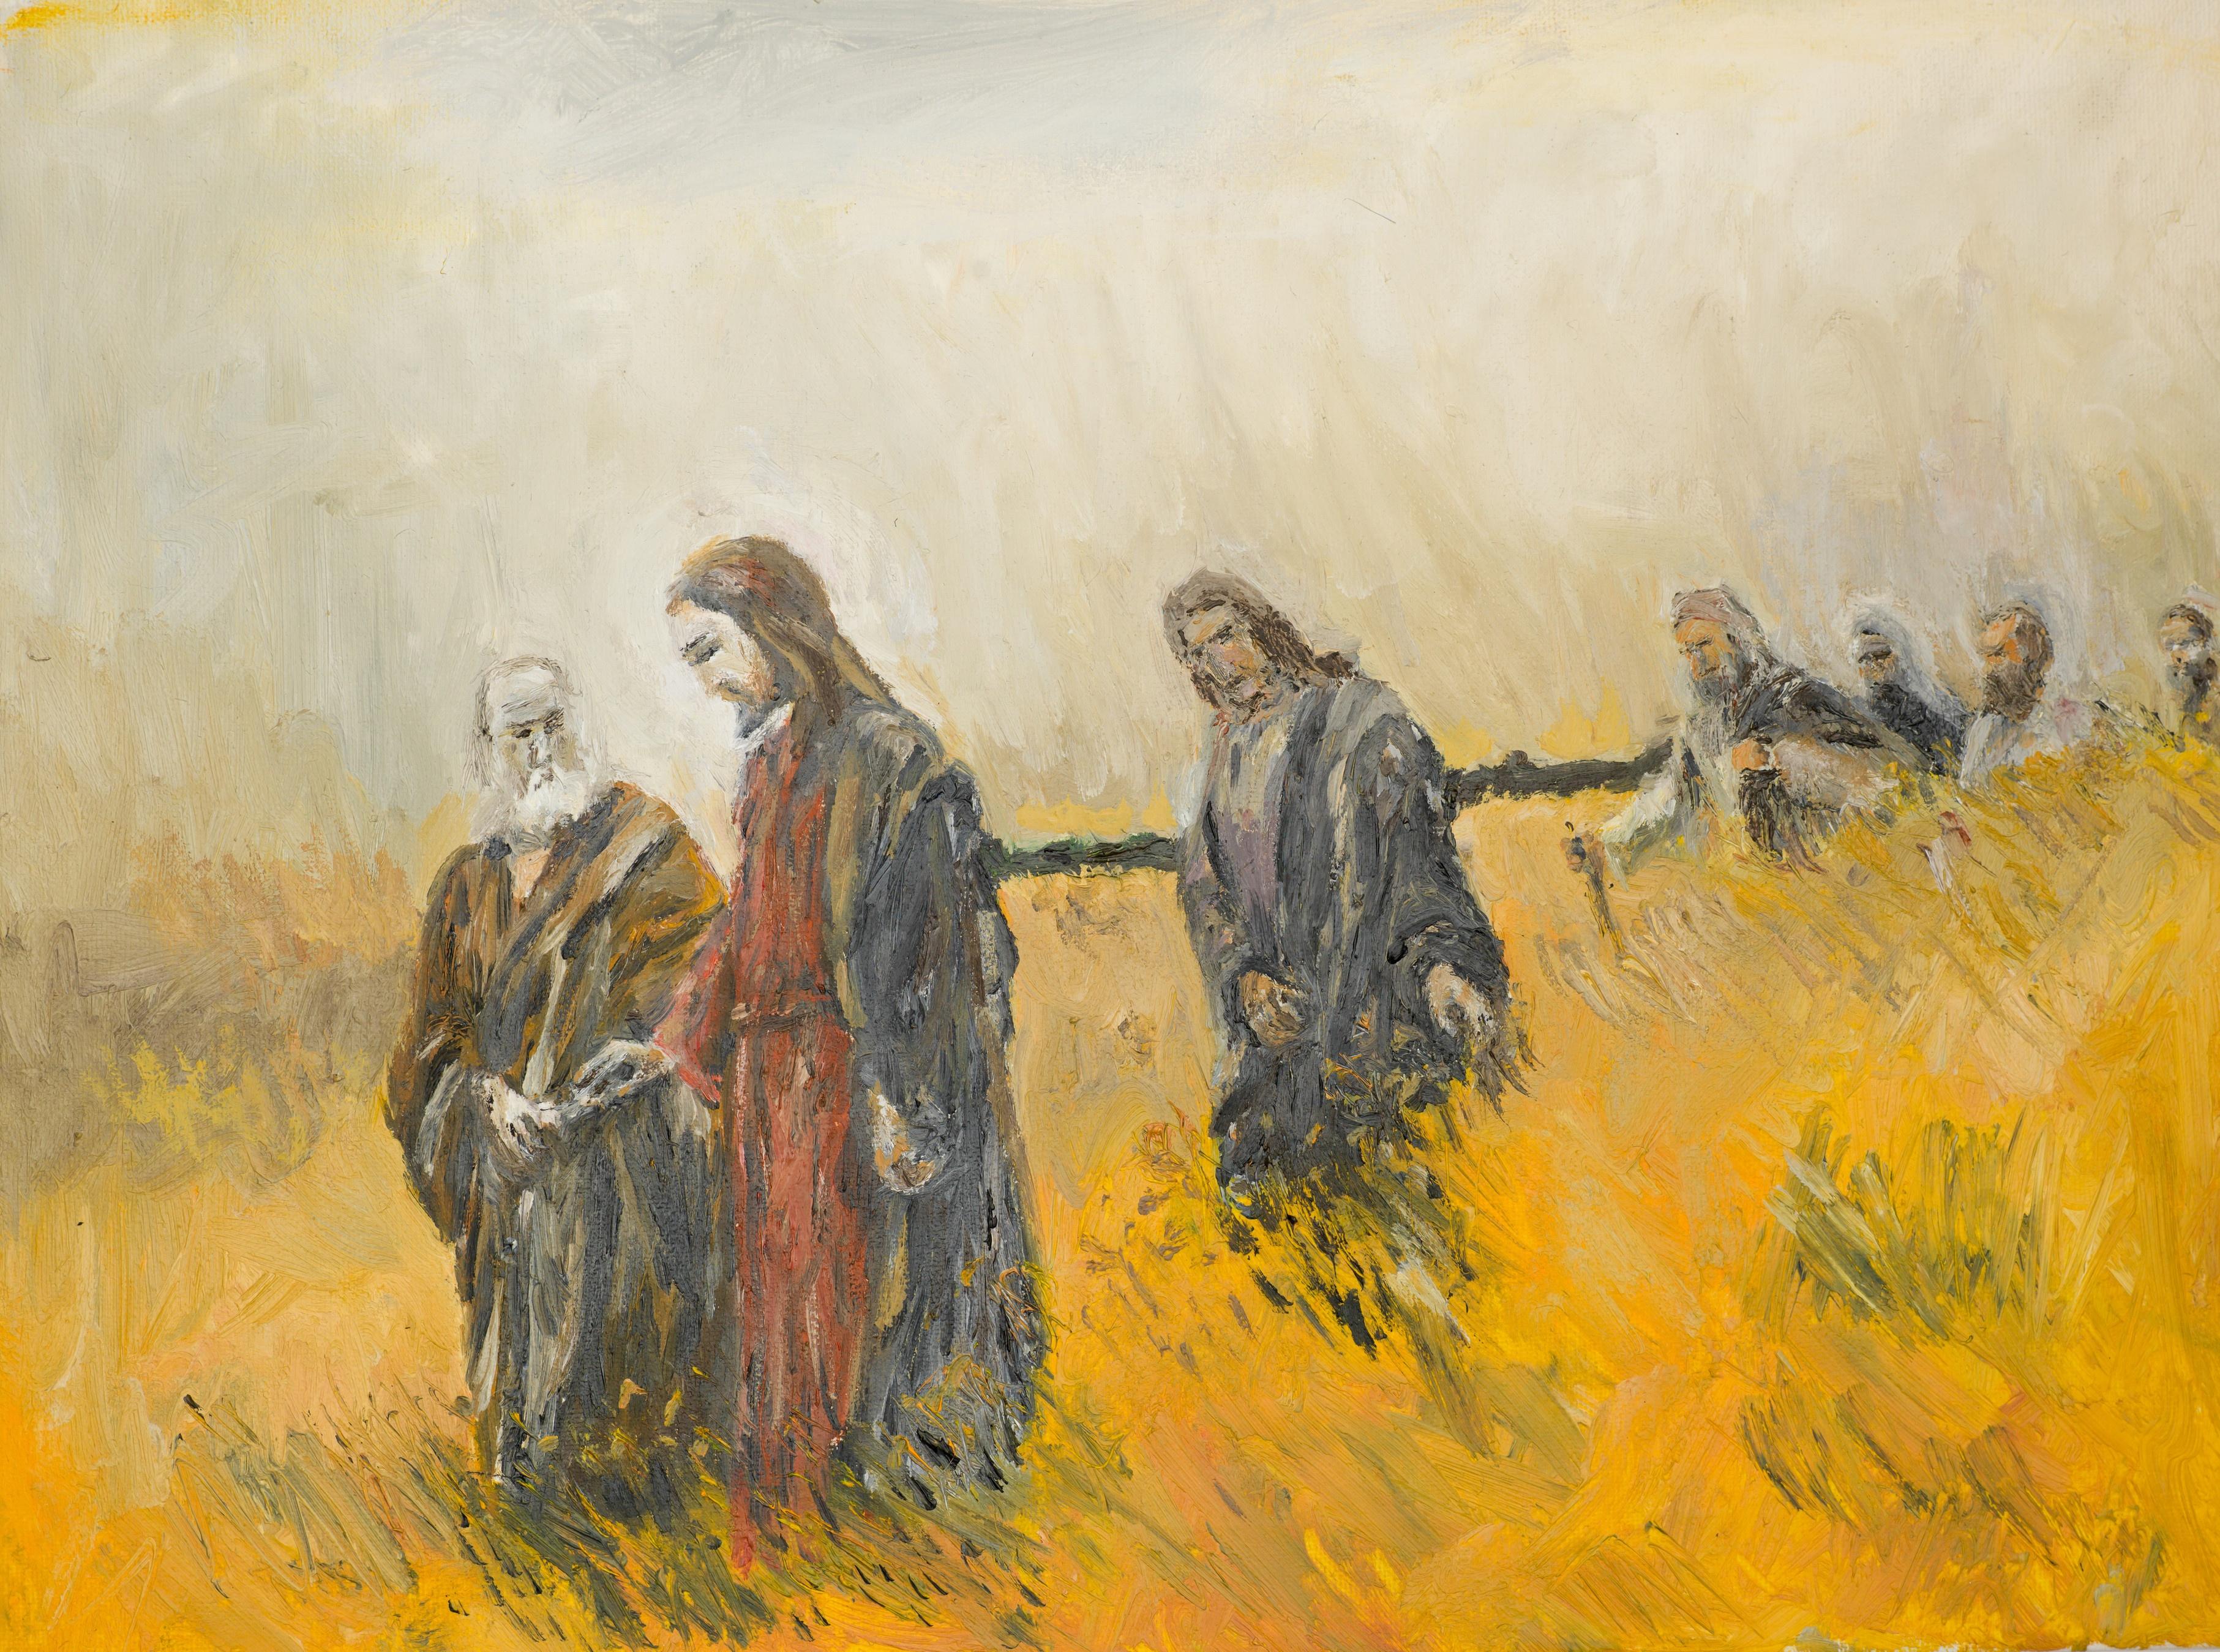 Jesus Defines True Humanity